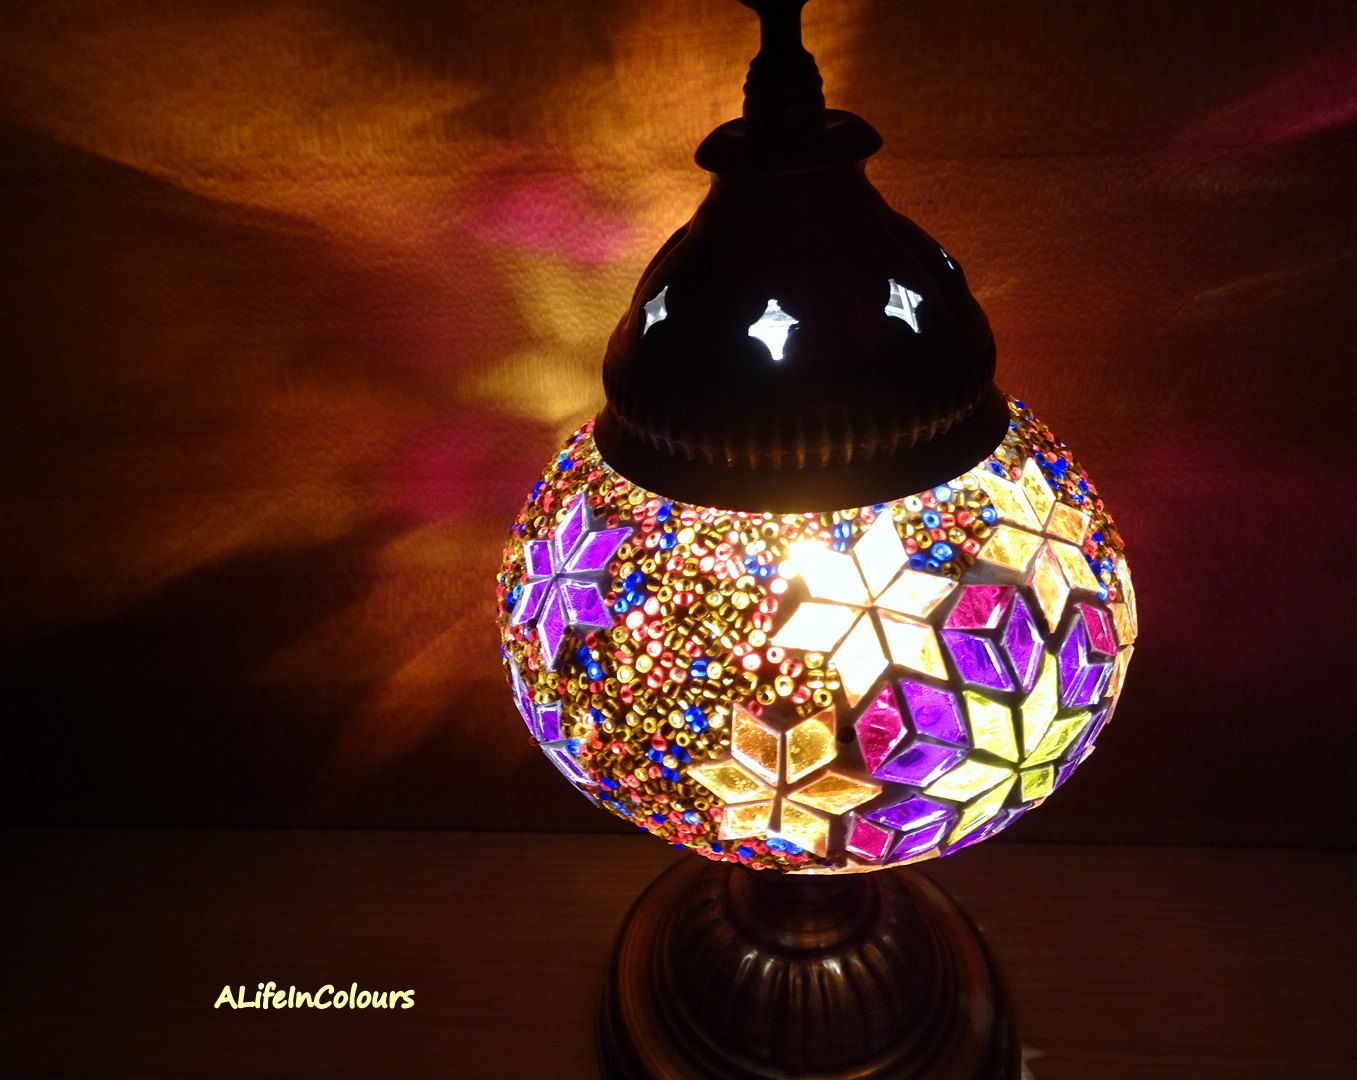 Night Lamp For Bedroom Colourful Turkish Handmade Glass Mosaic Table Lamp Bedroom Night